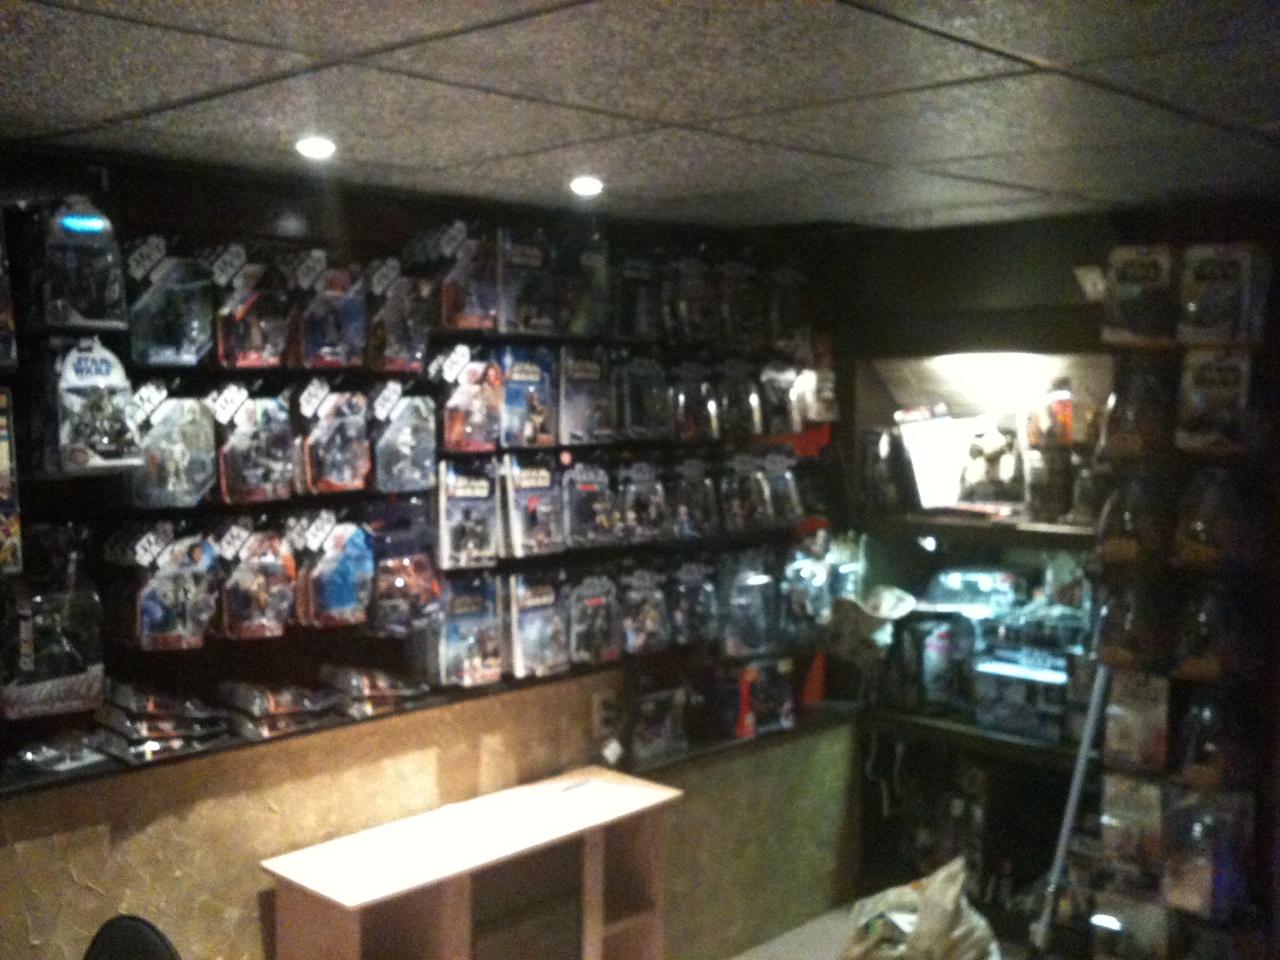 Man Cave Store Spokane : Gi joe bedroom and mancave hisstank.com